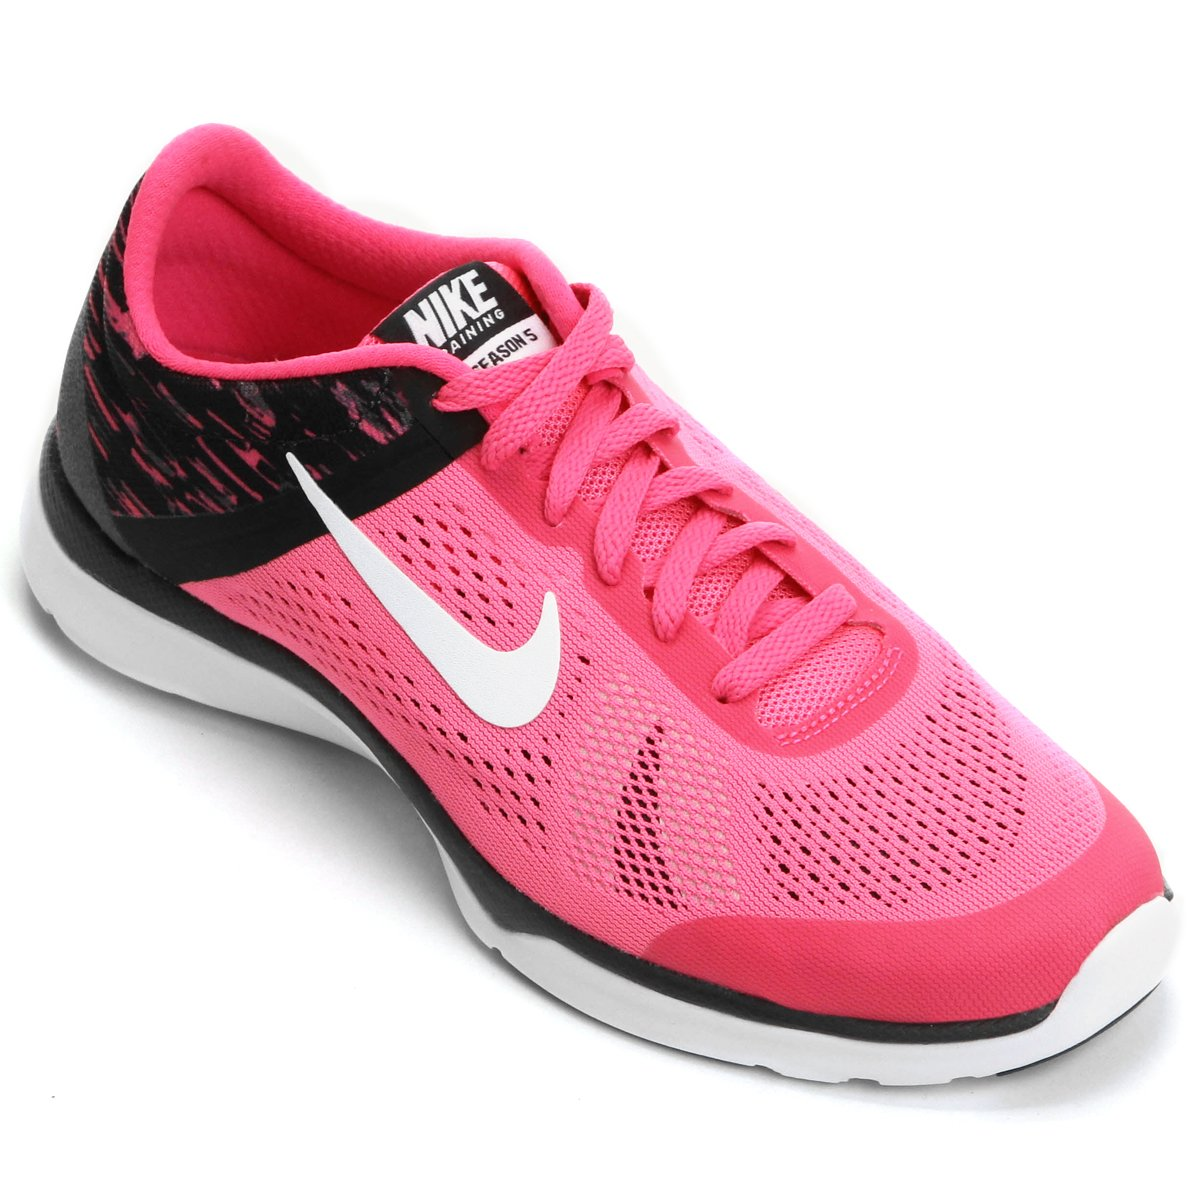 7bf282920a3 Tênis Nike In-Season Tr 5 Print Feminino - Compre Agora